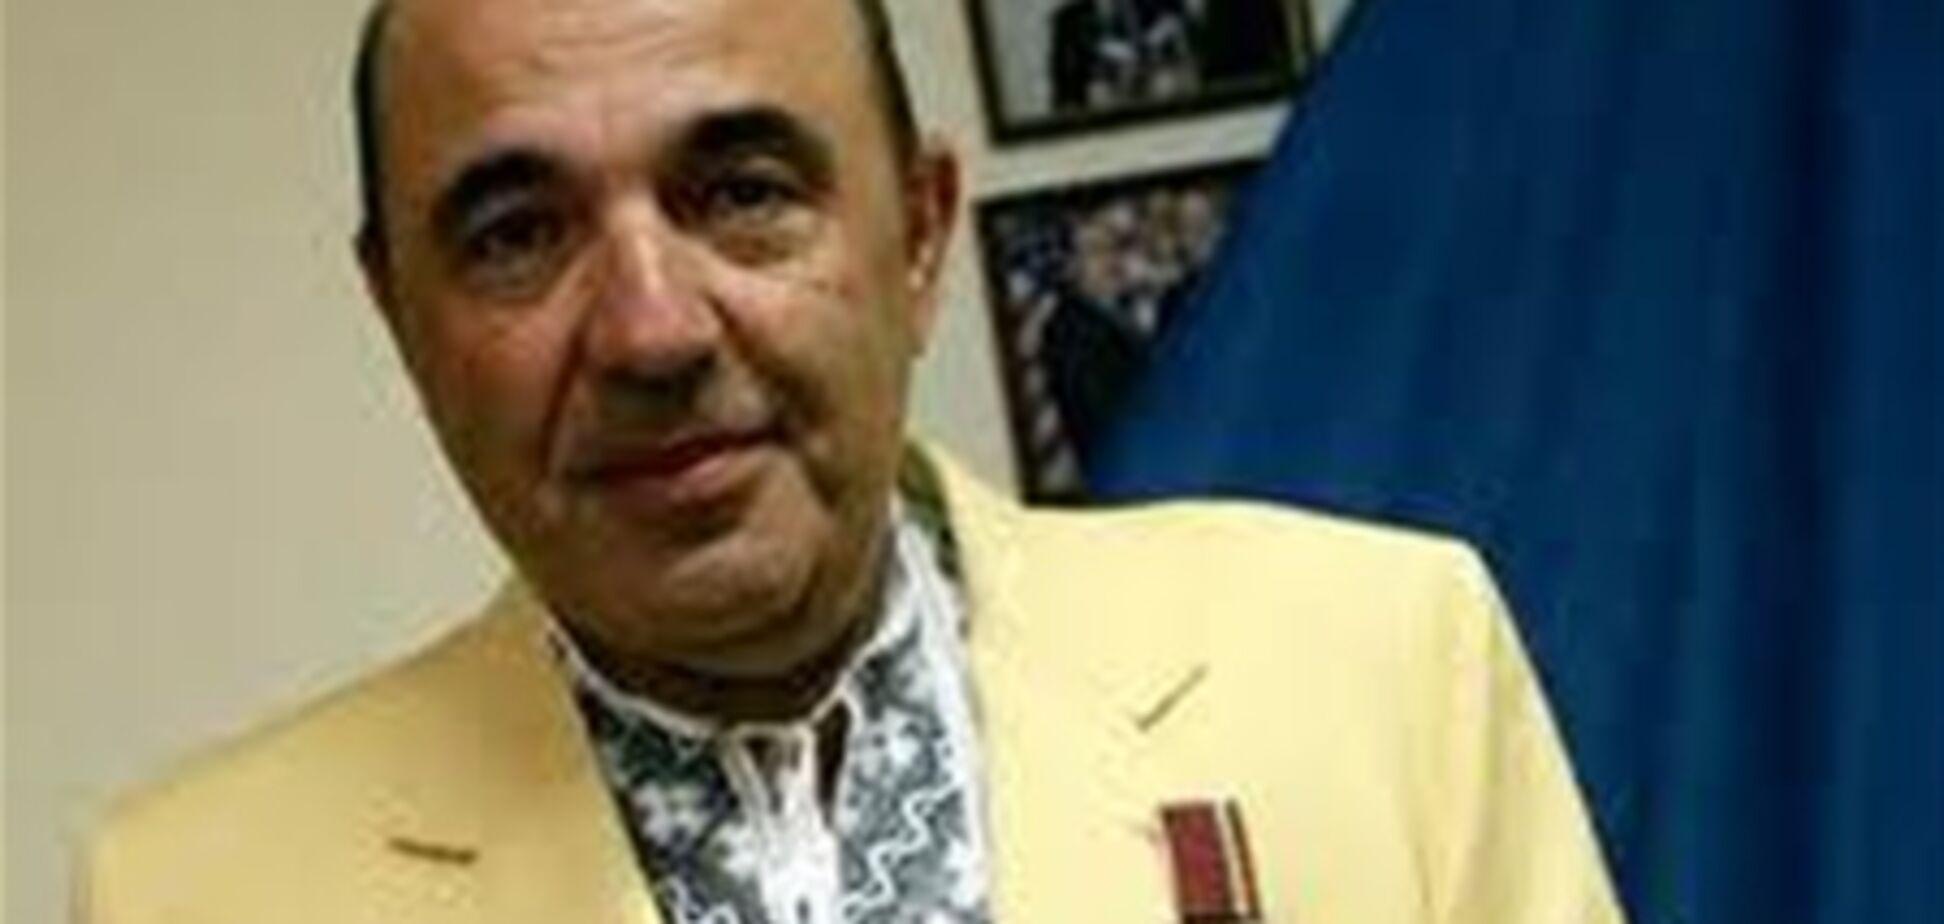 Друзья Рабиновича требуют 'наказать шакалов'